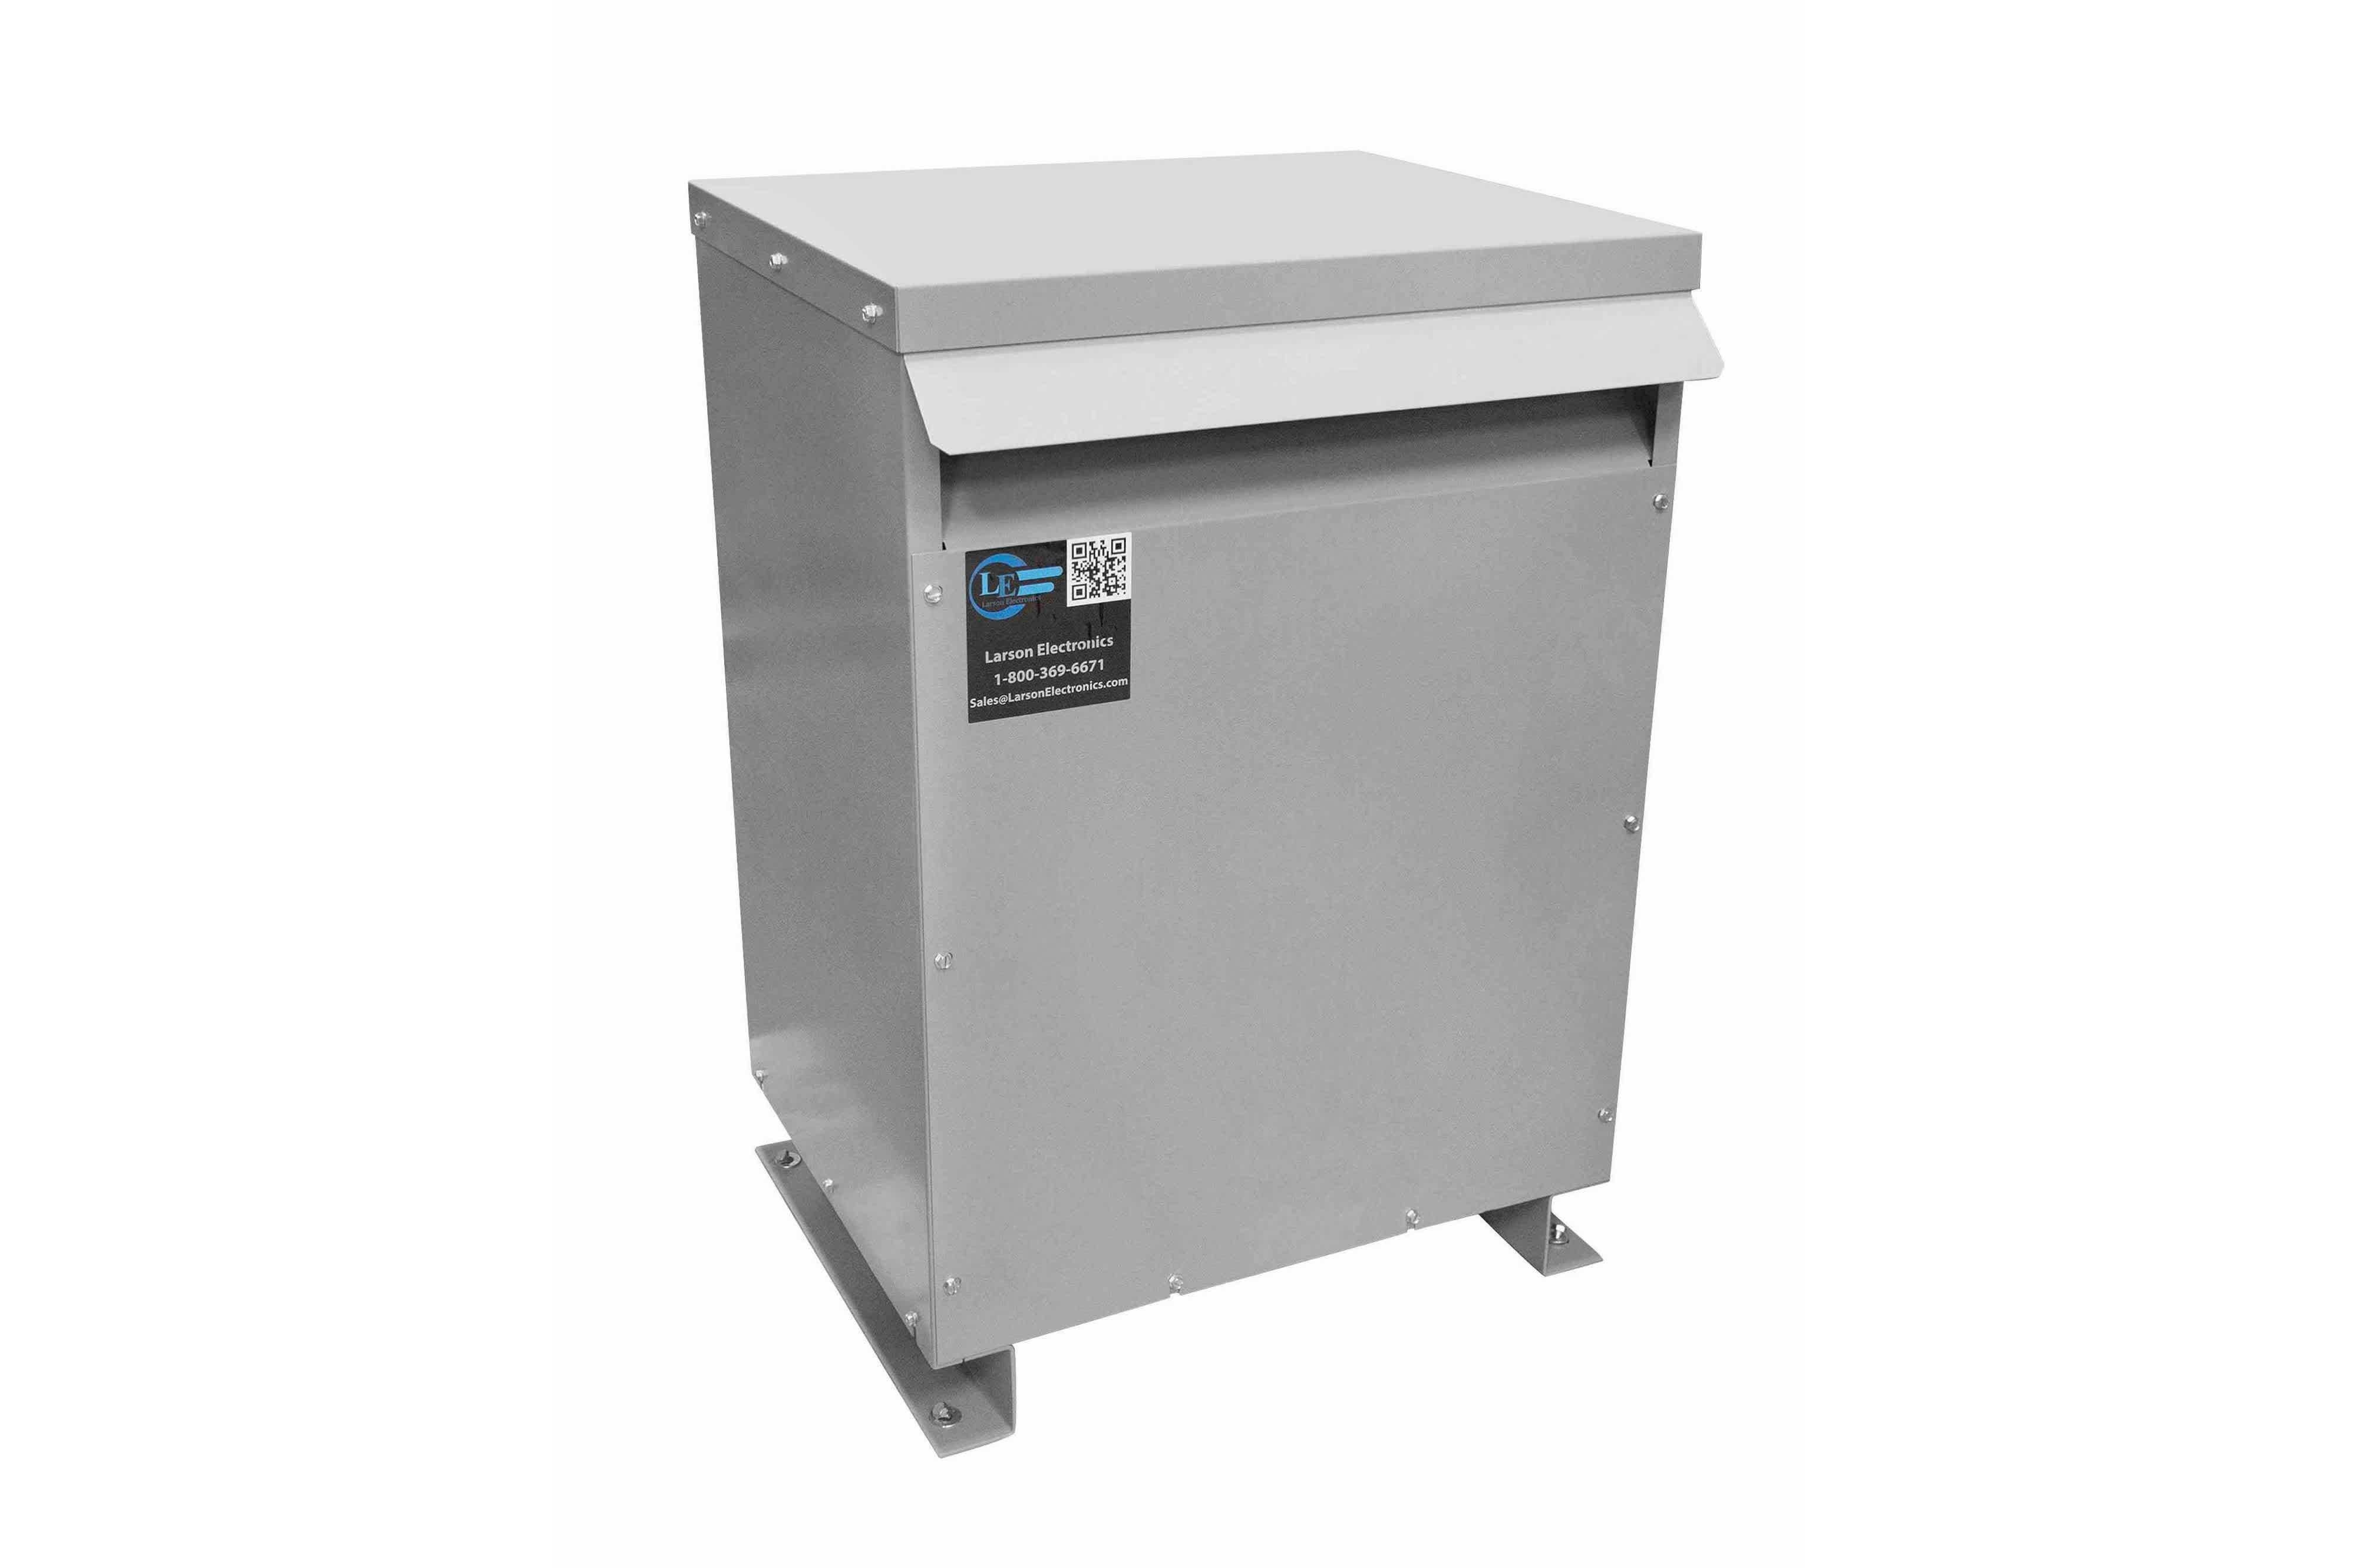 237.5 kVA 3PH Isolation Transformer, 400V Wye Primary, 240V Delta Secondary, N3R, Ventilated, 60 Hz